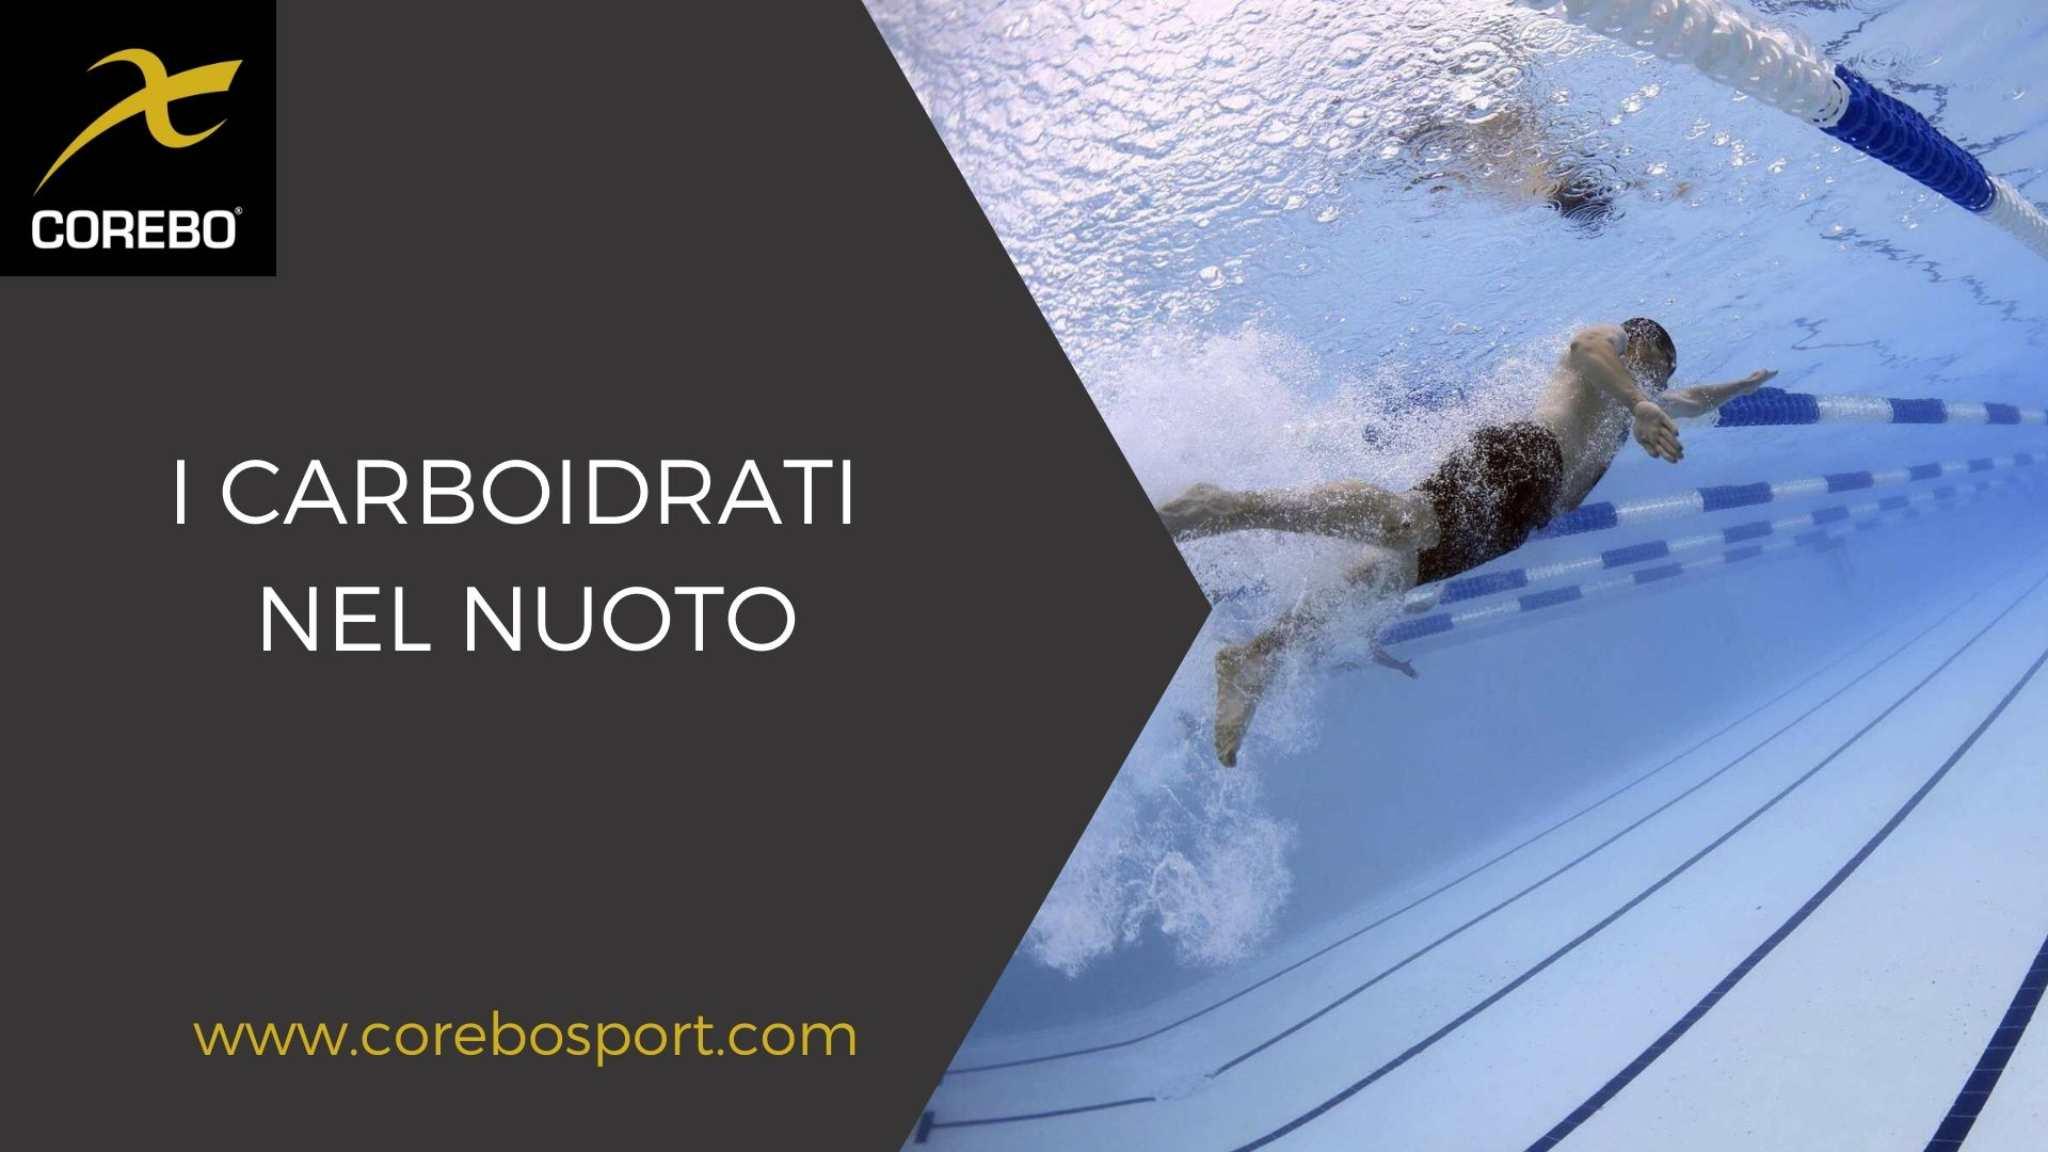 I carboidrati nel nuoto